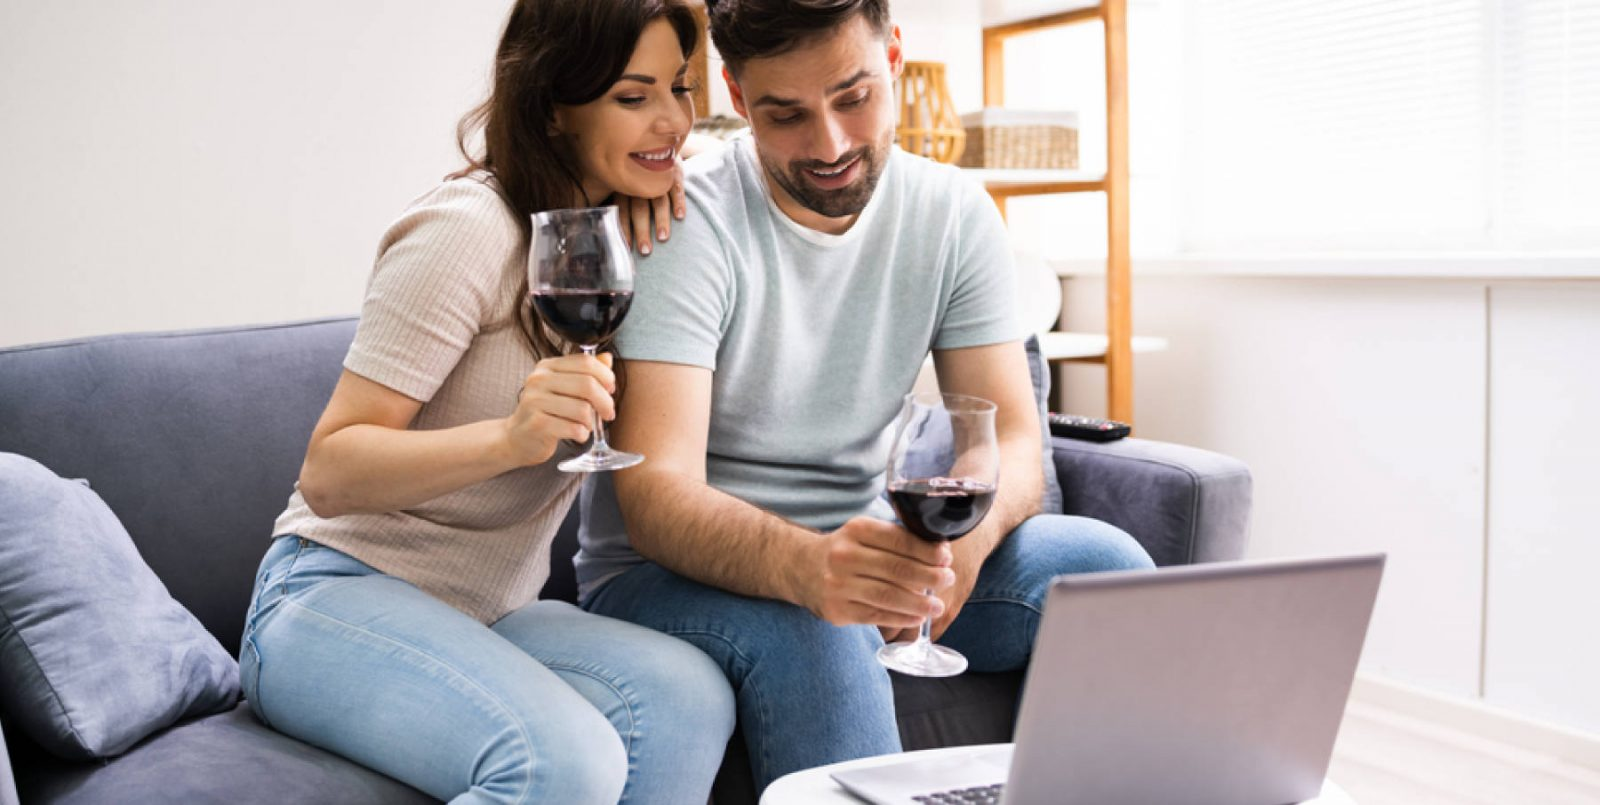 Wine tasting online: 5 consigli per una degustazione perfetta